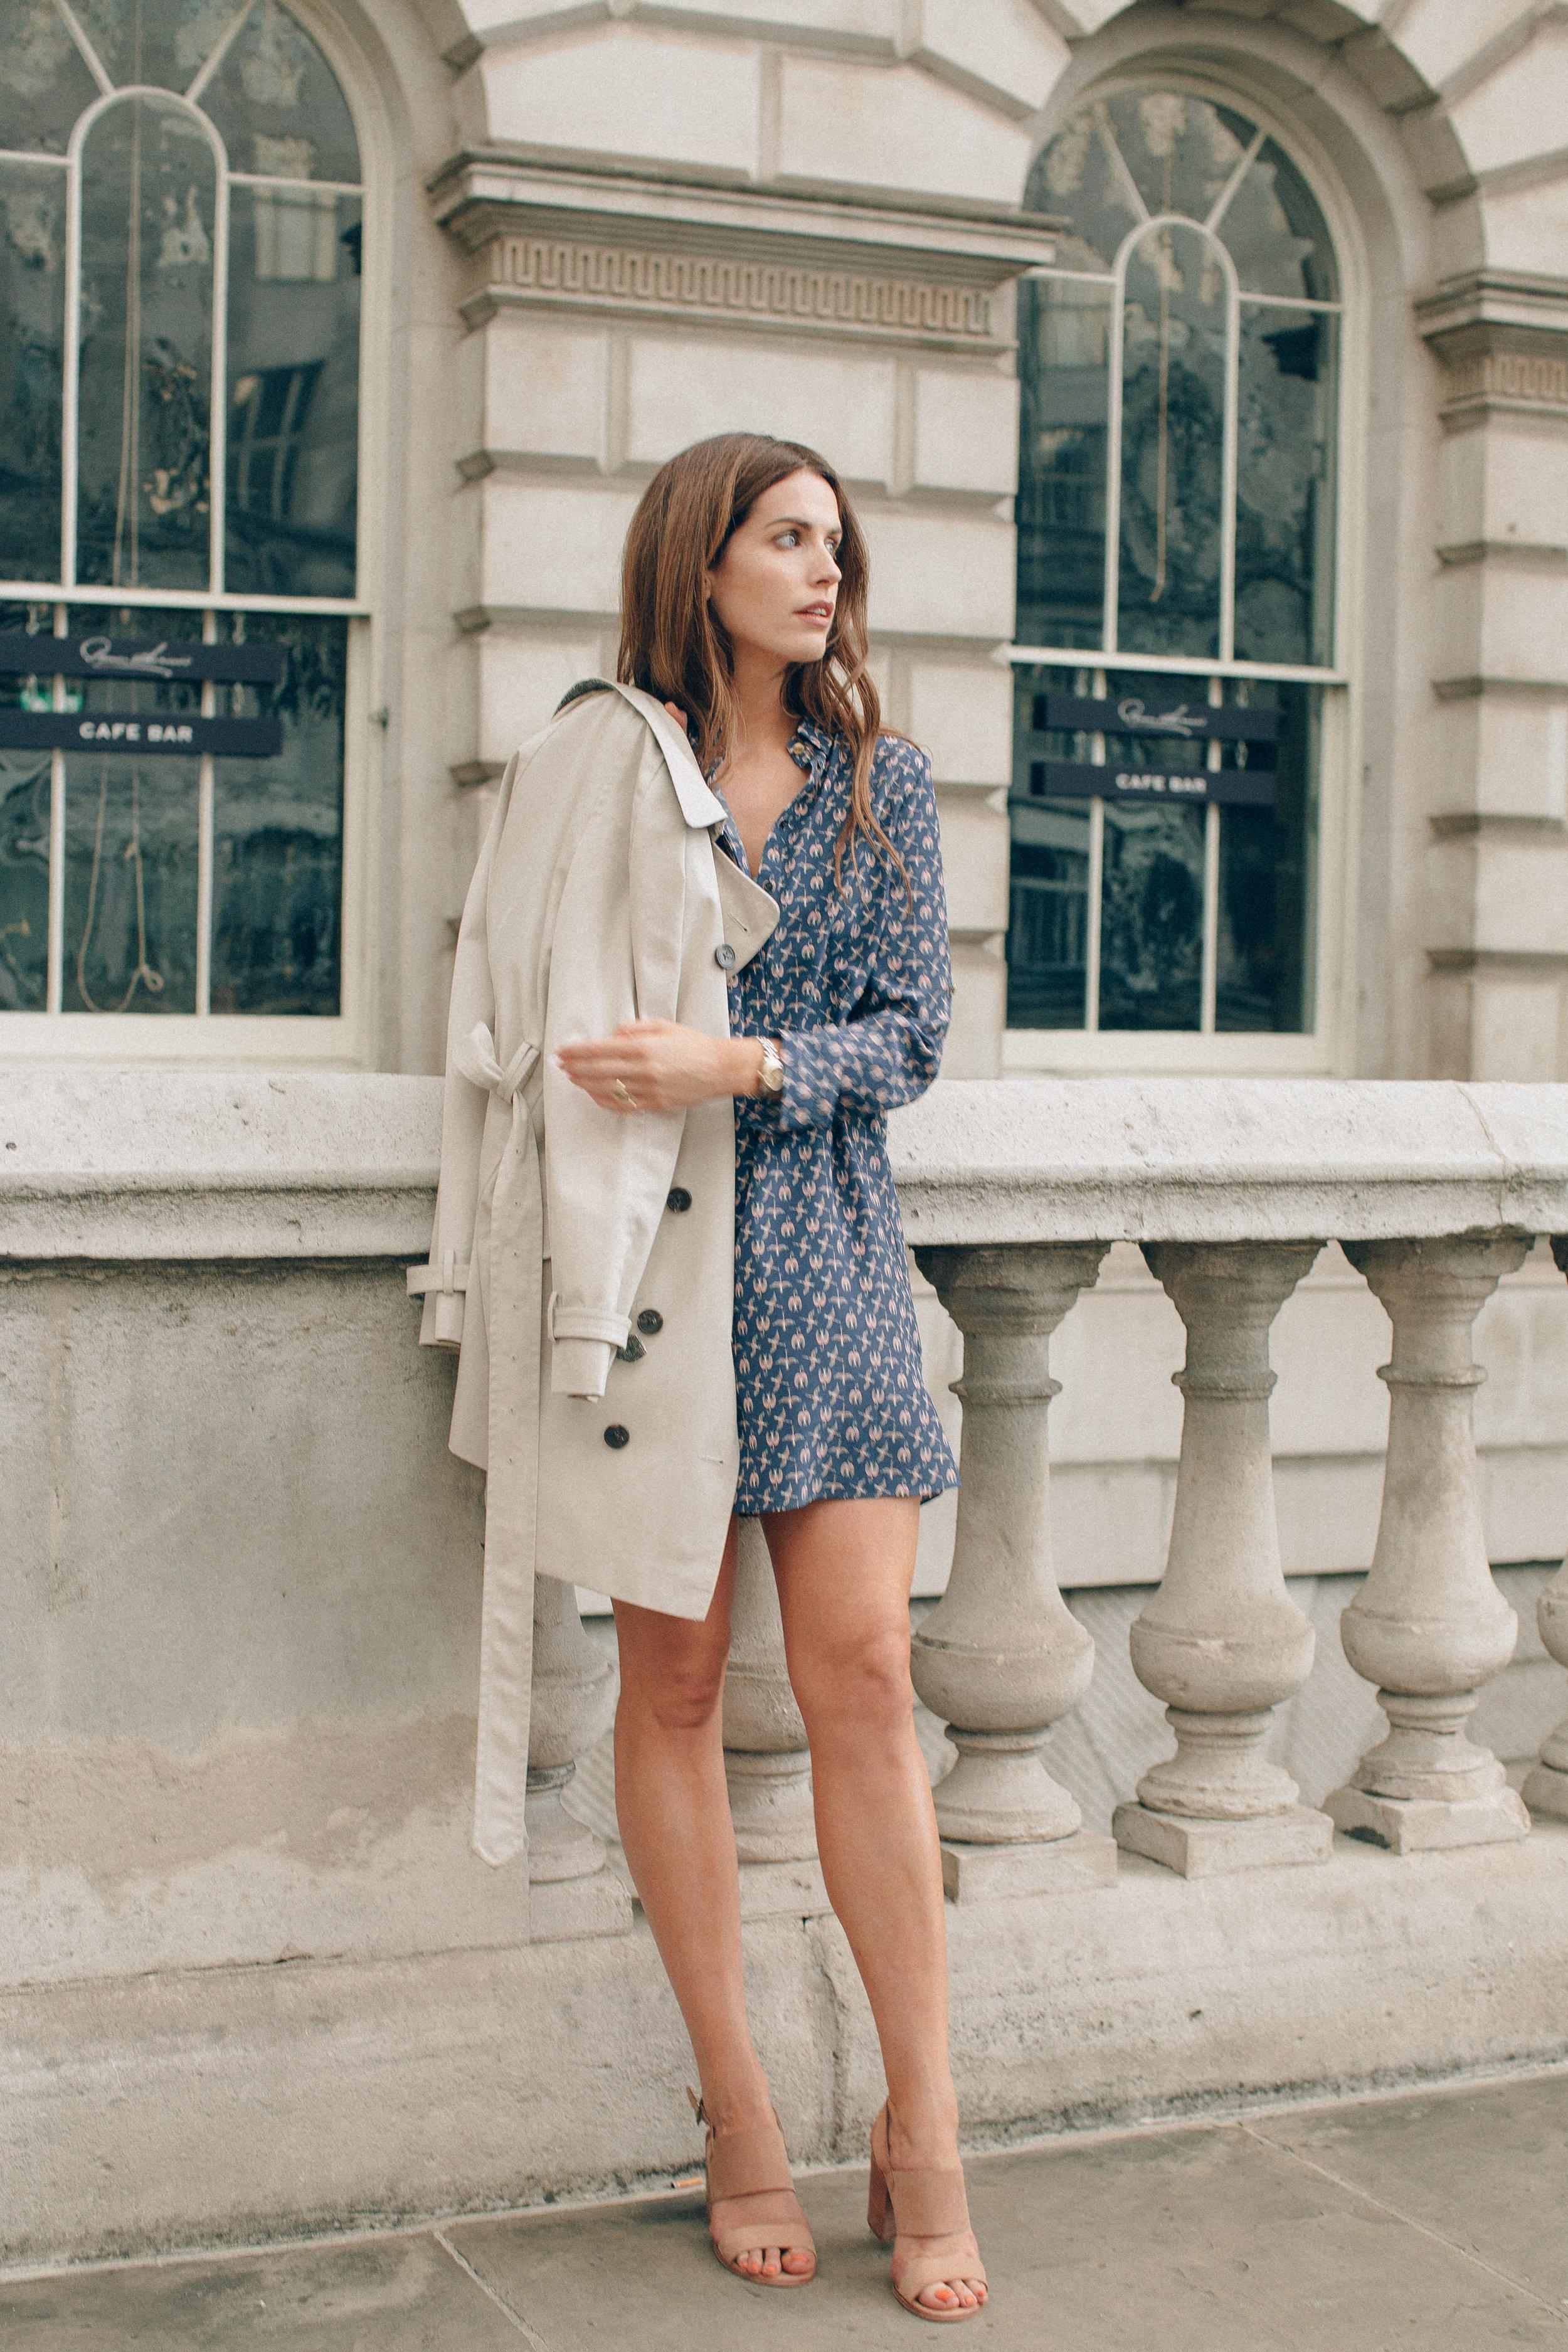 Blue mini dress and trench coat